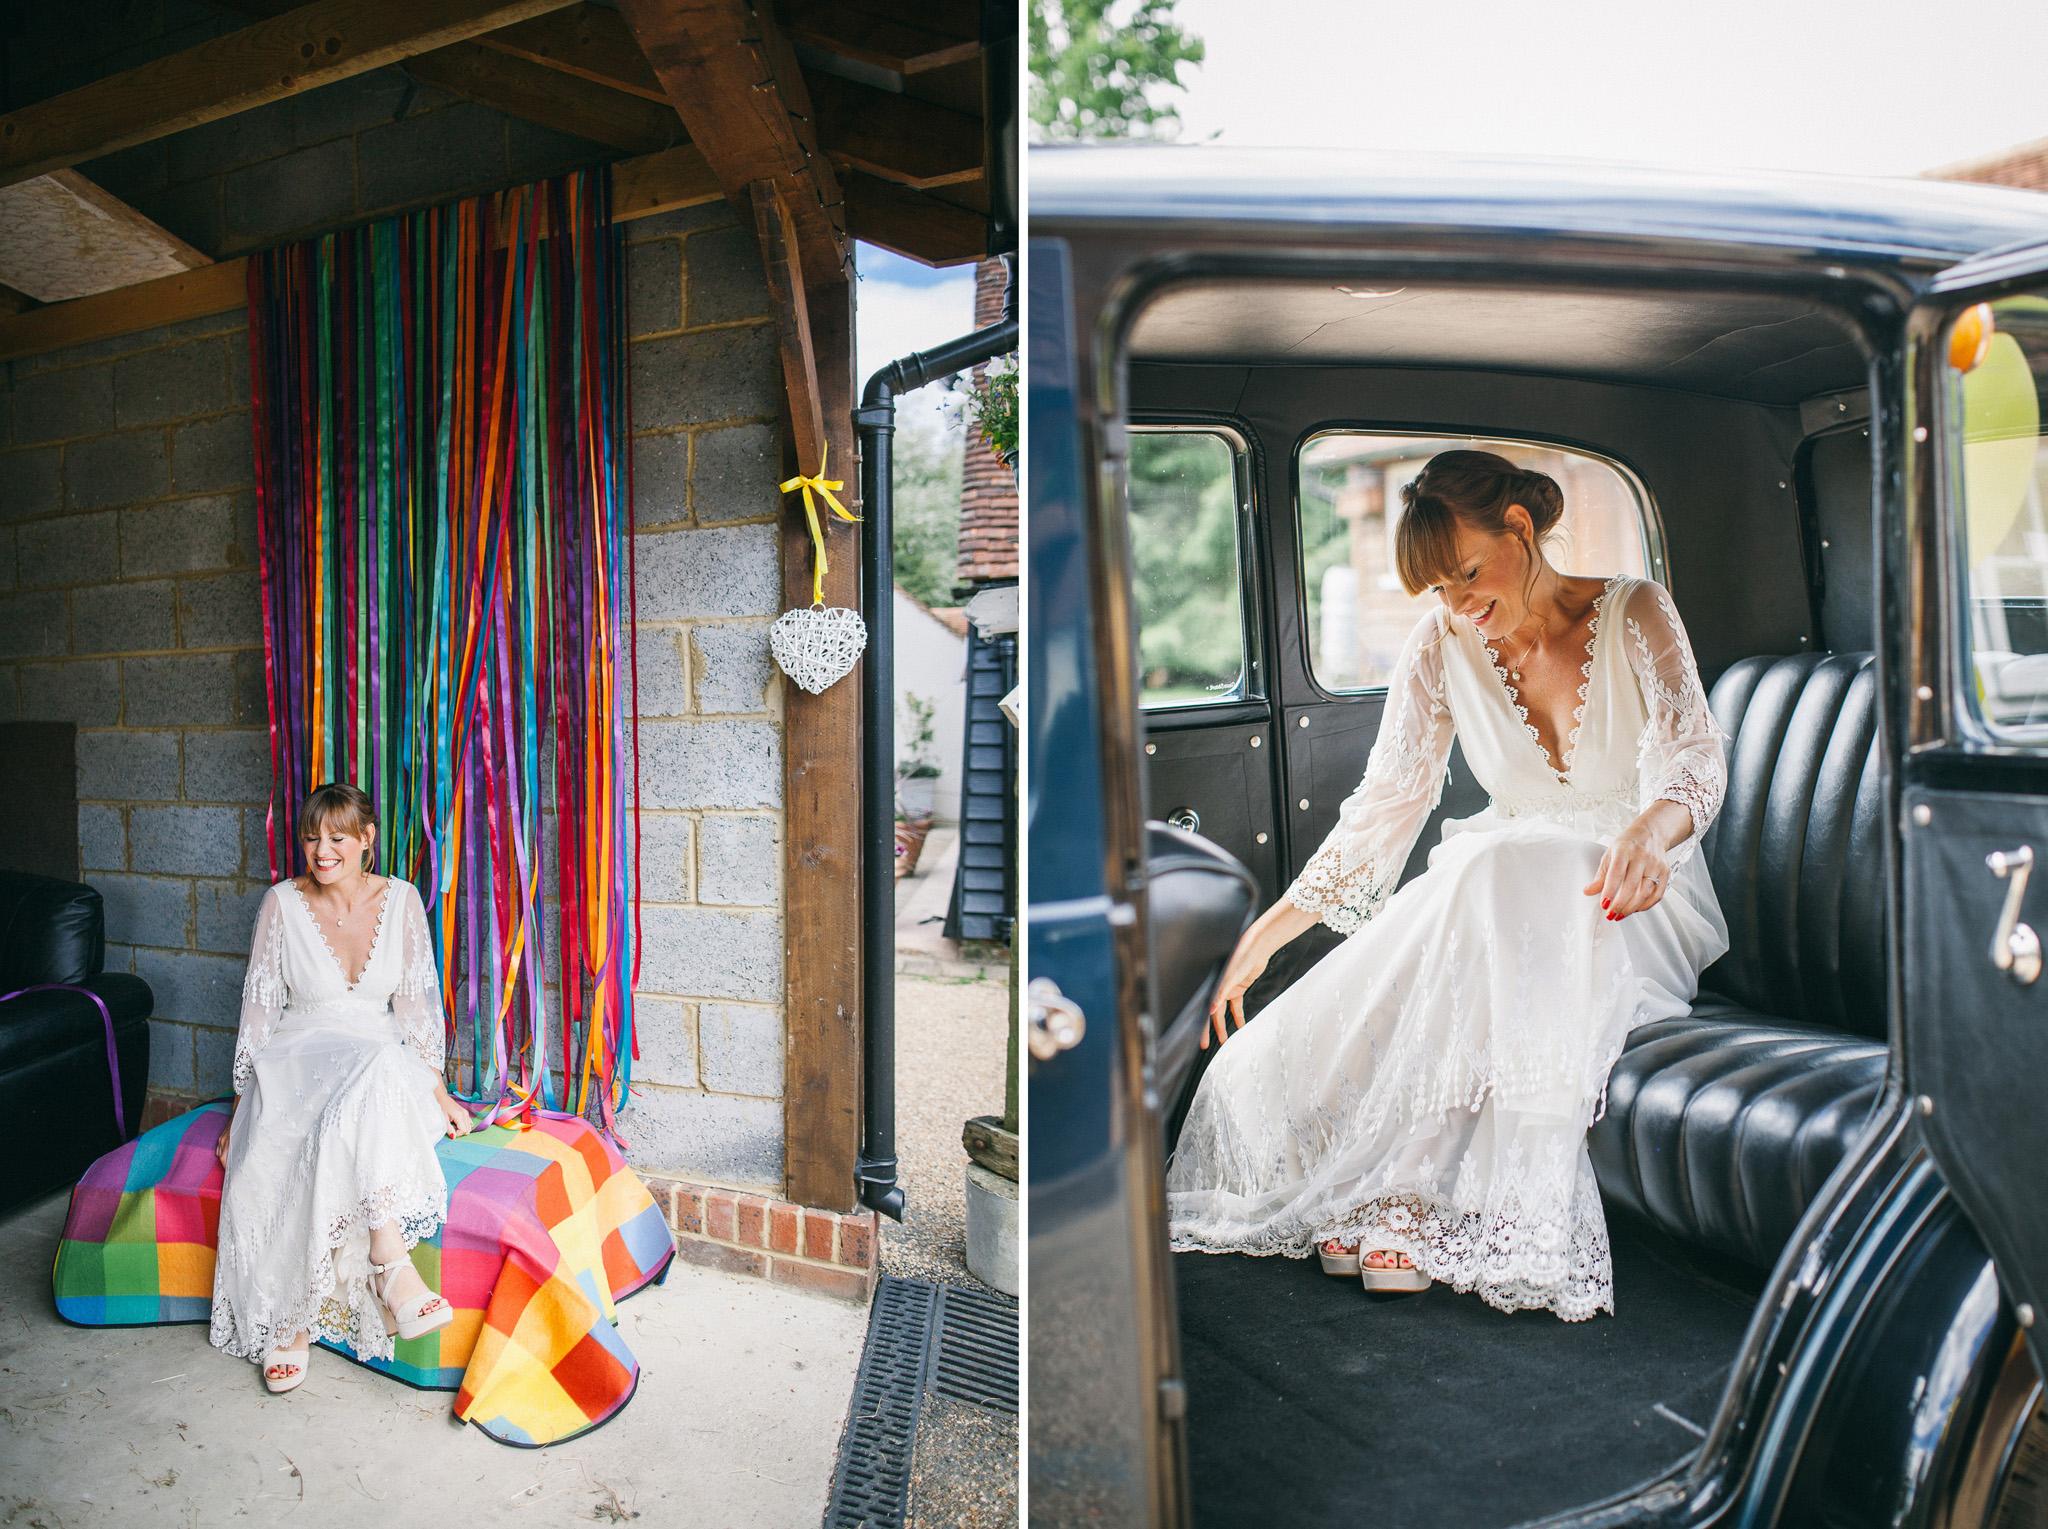 chantry_sussex_barn_wedding_296.jpg